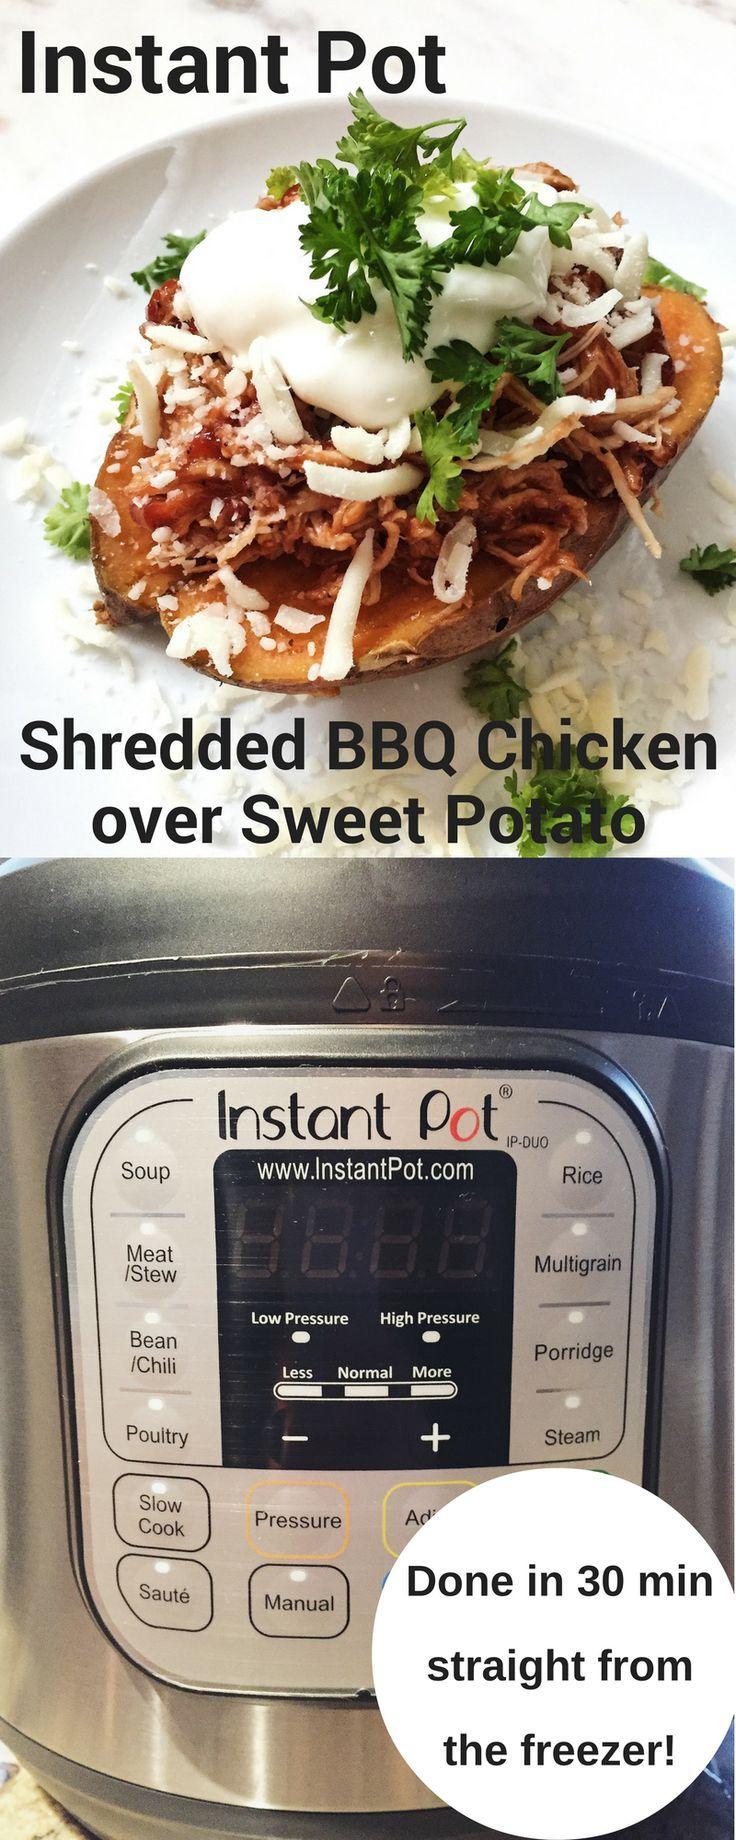 Instant Pot | Pressure Cooker Recipes | 30 min meals | Weeknight Meals | Healthy...